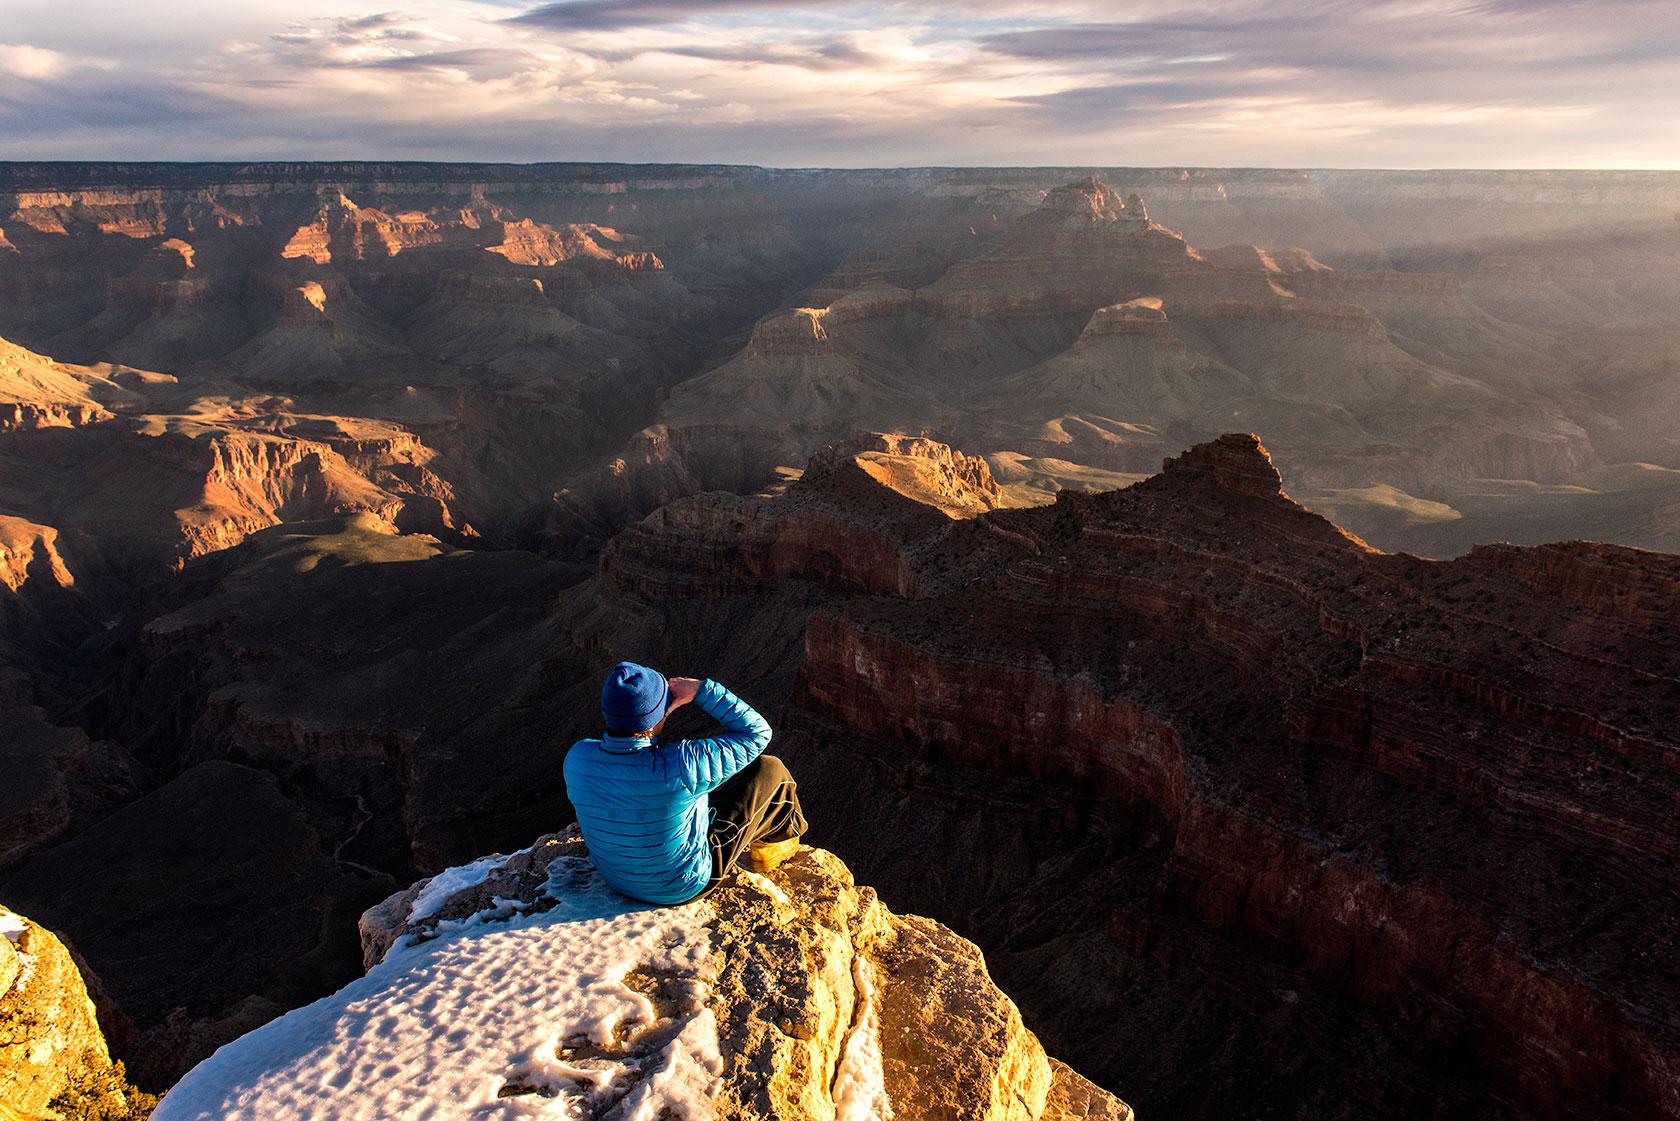 austin-trigg-osprey-hiking-backpacks-grand-canyon-osprey-pack-bag-arizona-hike-camp-sunrise-mather-point-rim.jpg